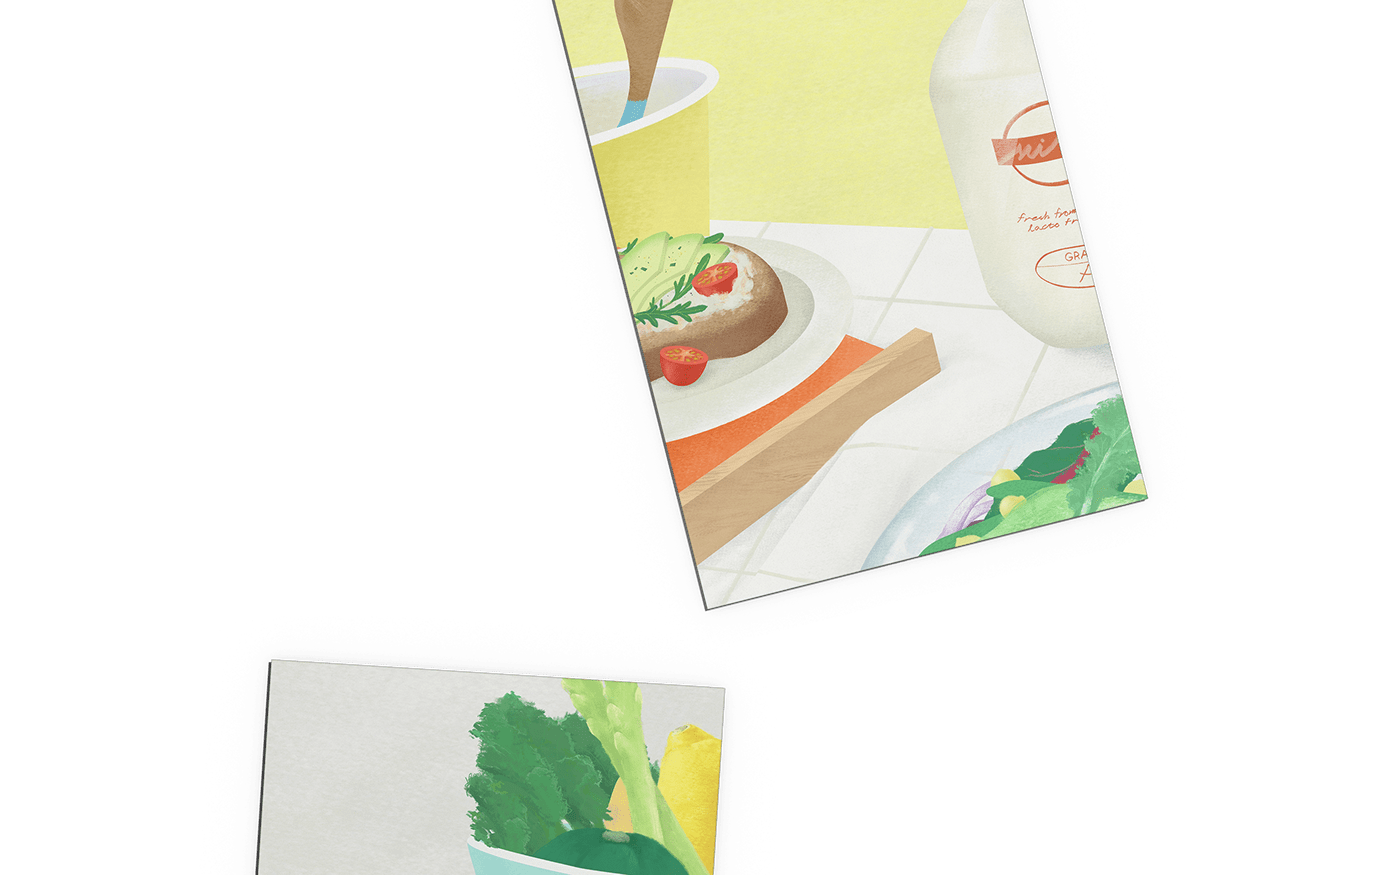 cook design environment graphic graphic design  ILLUSTRATION  Layout Layout Design still life vegan